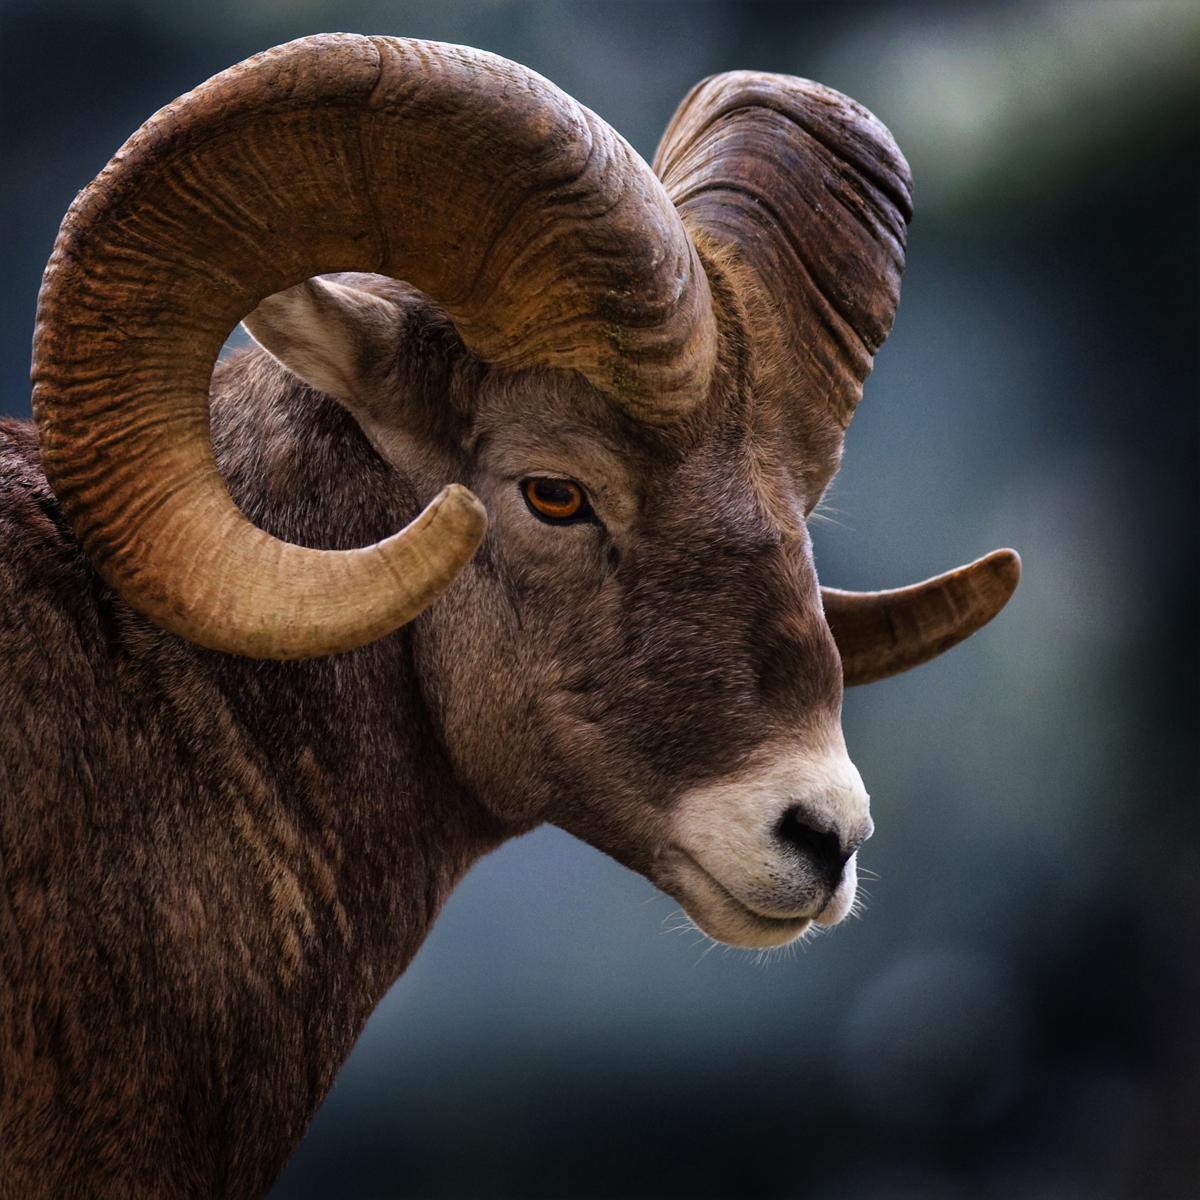 Ram Big Horn >> File:Big Horn Sheep, Montana, USA.jpg - Wikimedia Commons